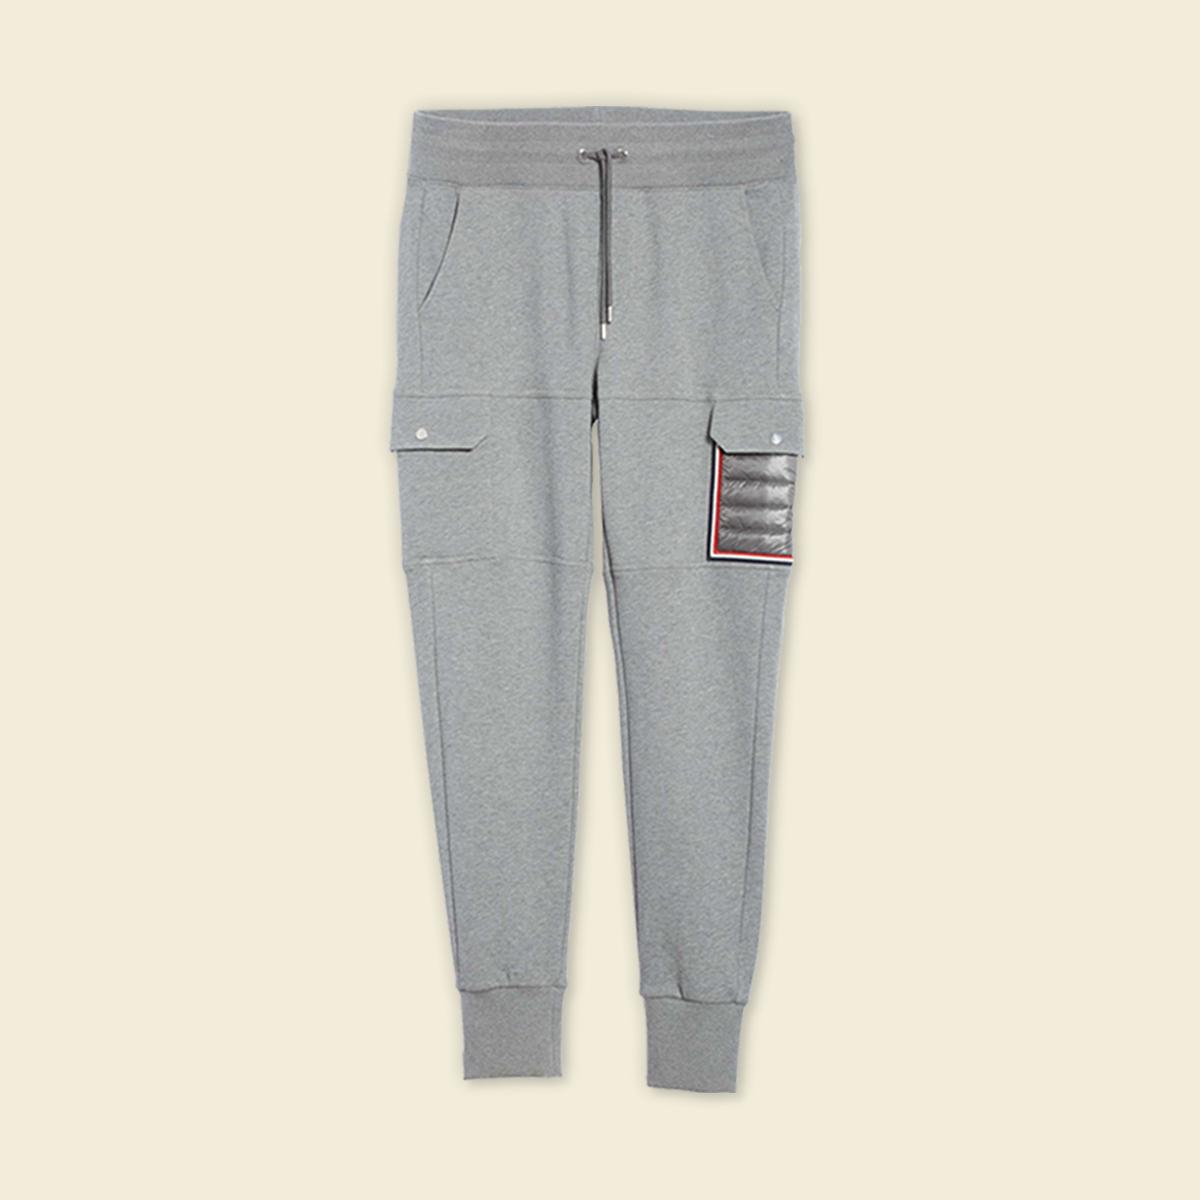 Grey sweatpants.